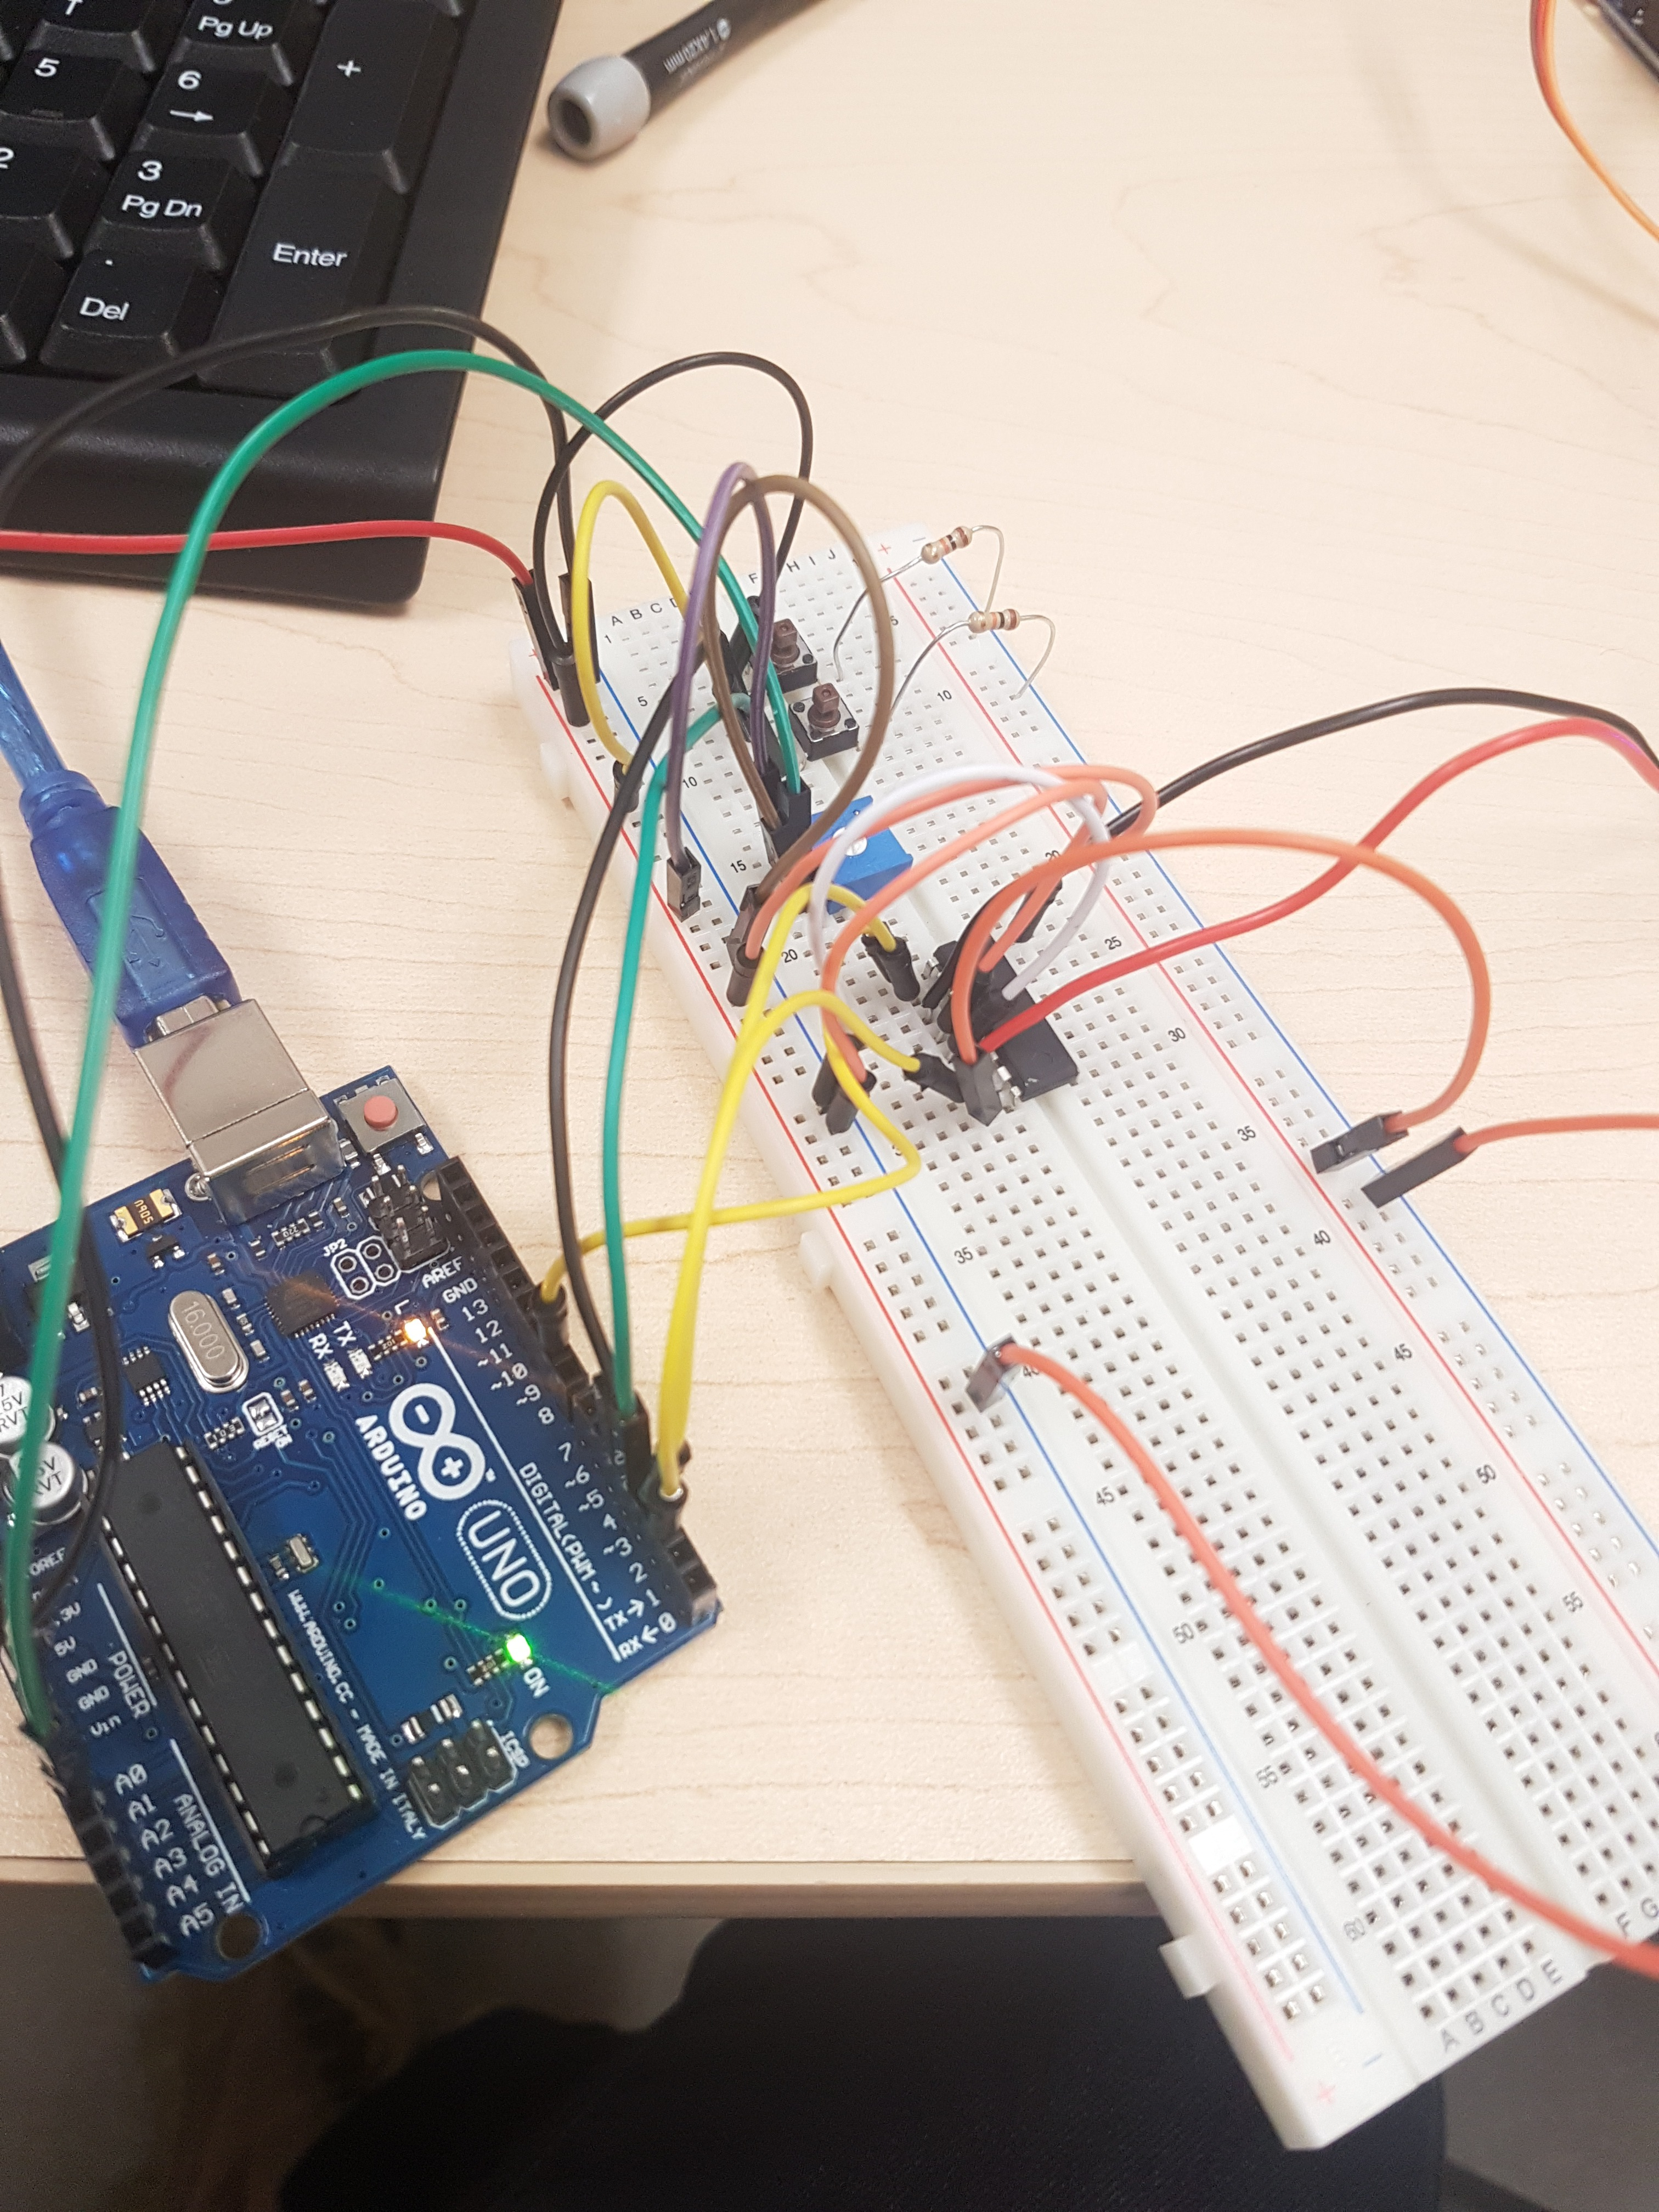 Picture of Adding the Potentiometer and H-Bridge